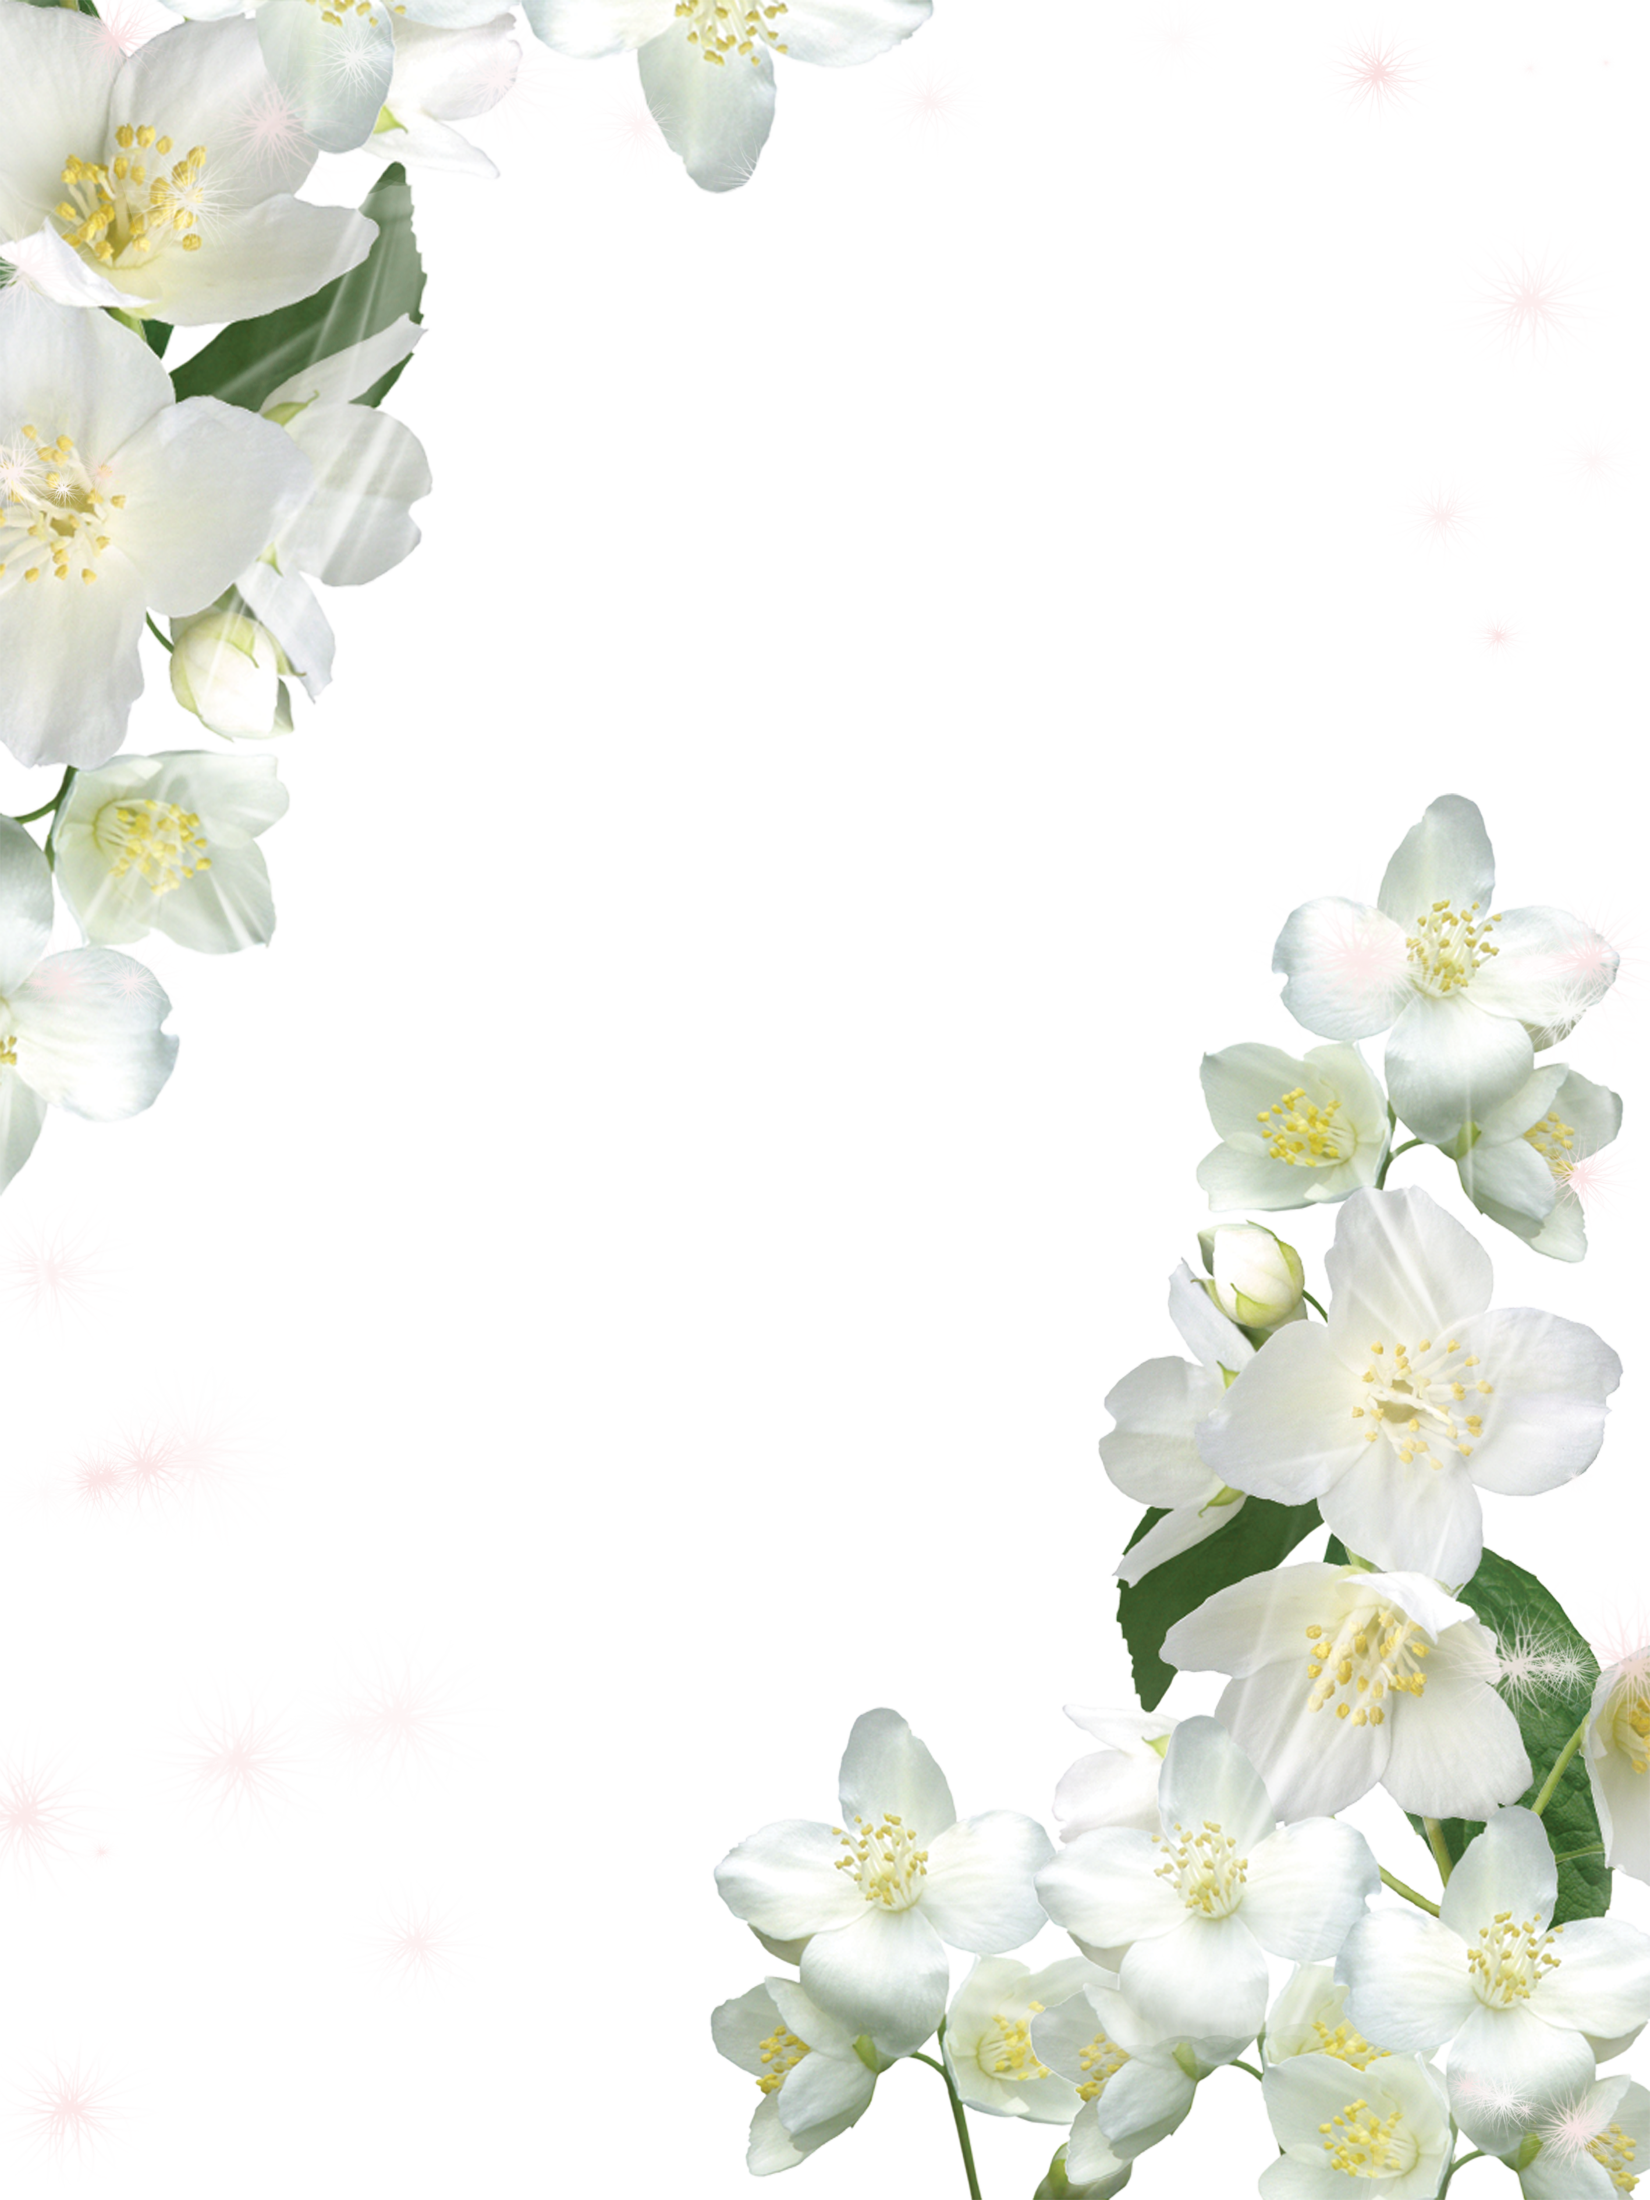 Transparent White Photo Frame with White Flowers | White photo frames,  Flower frame, Floral graphic design